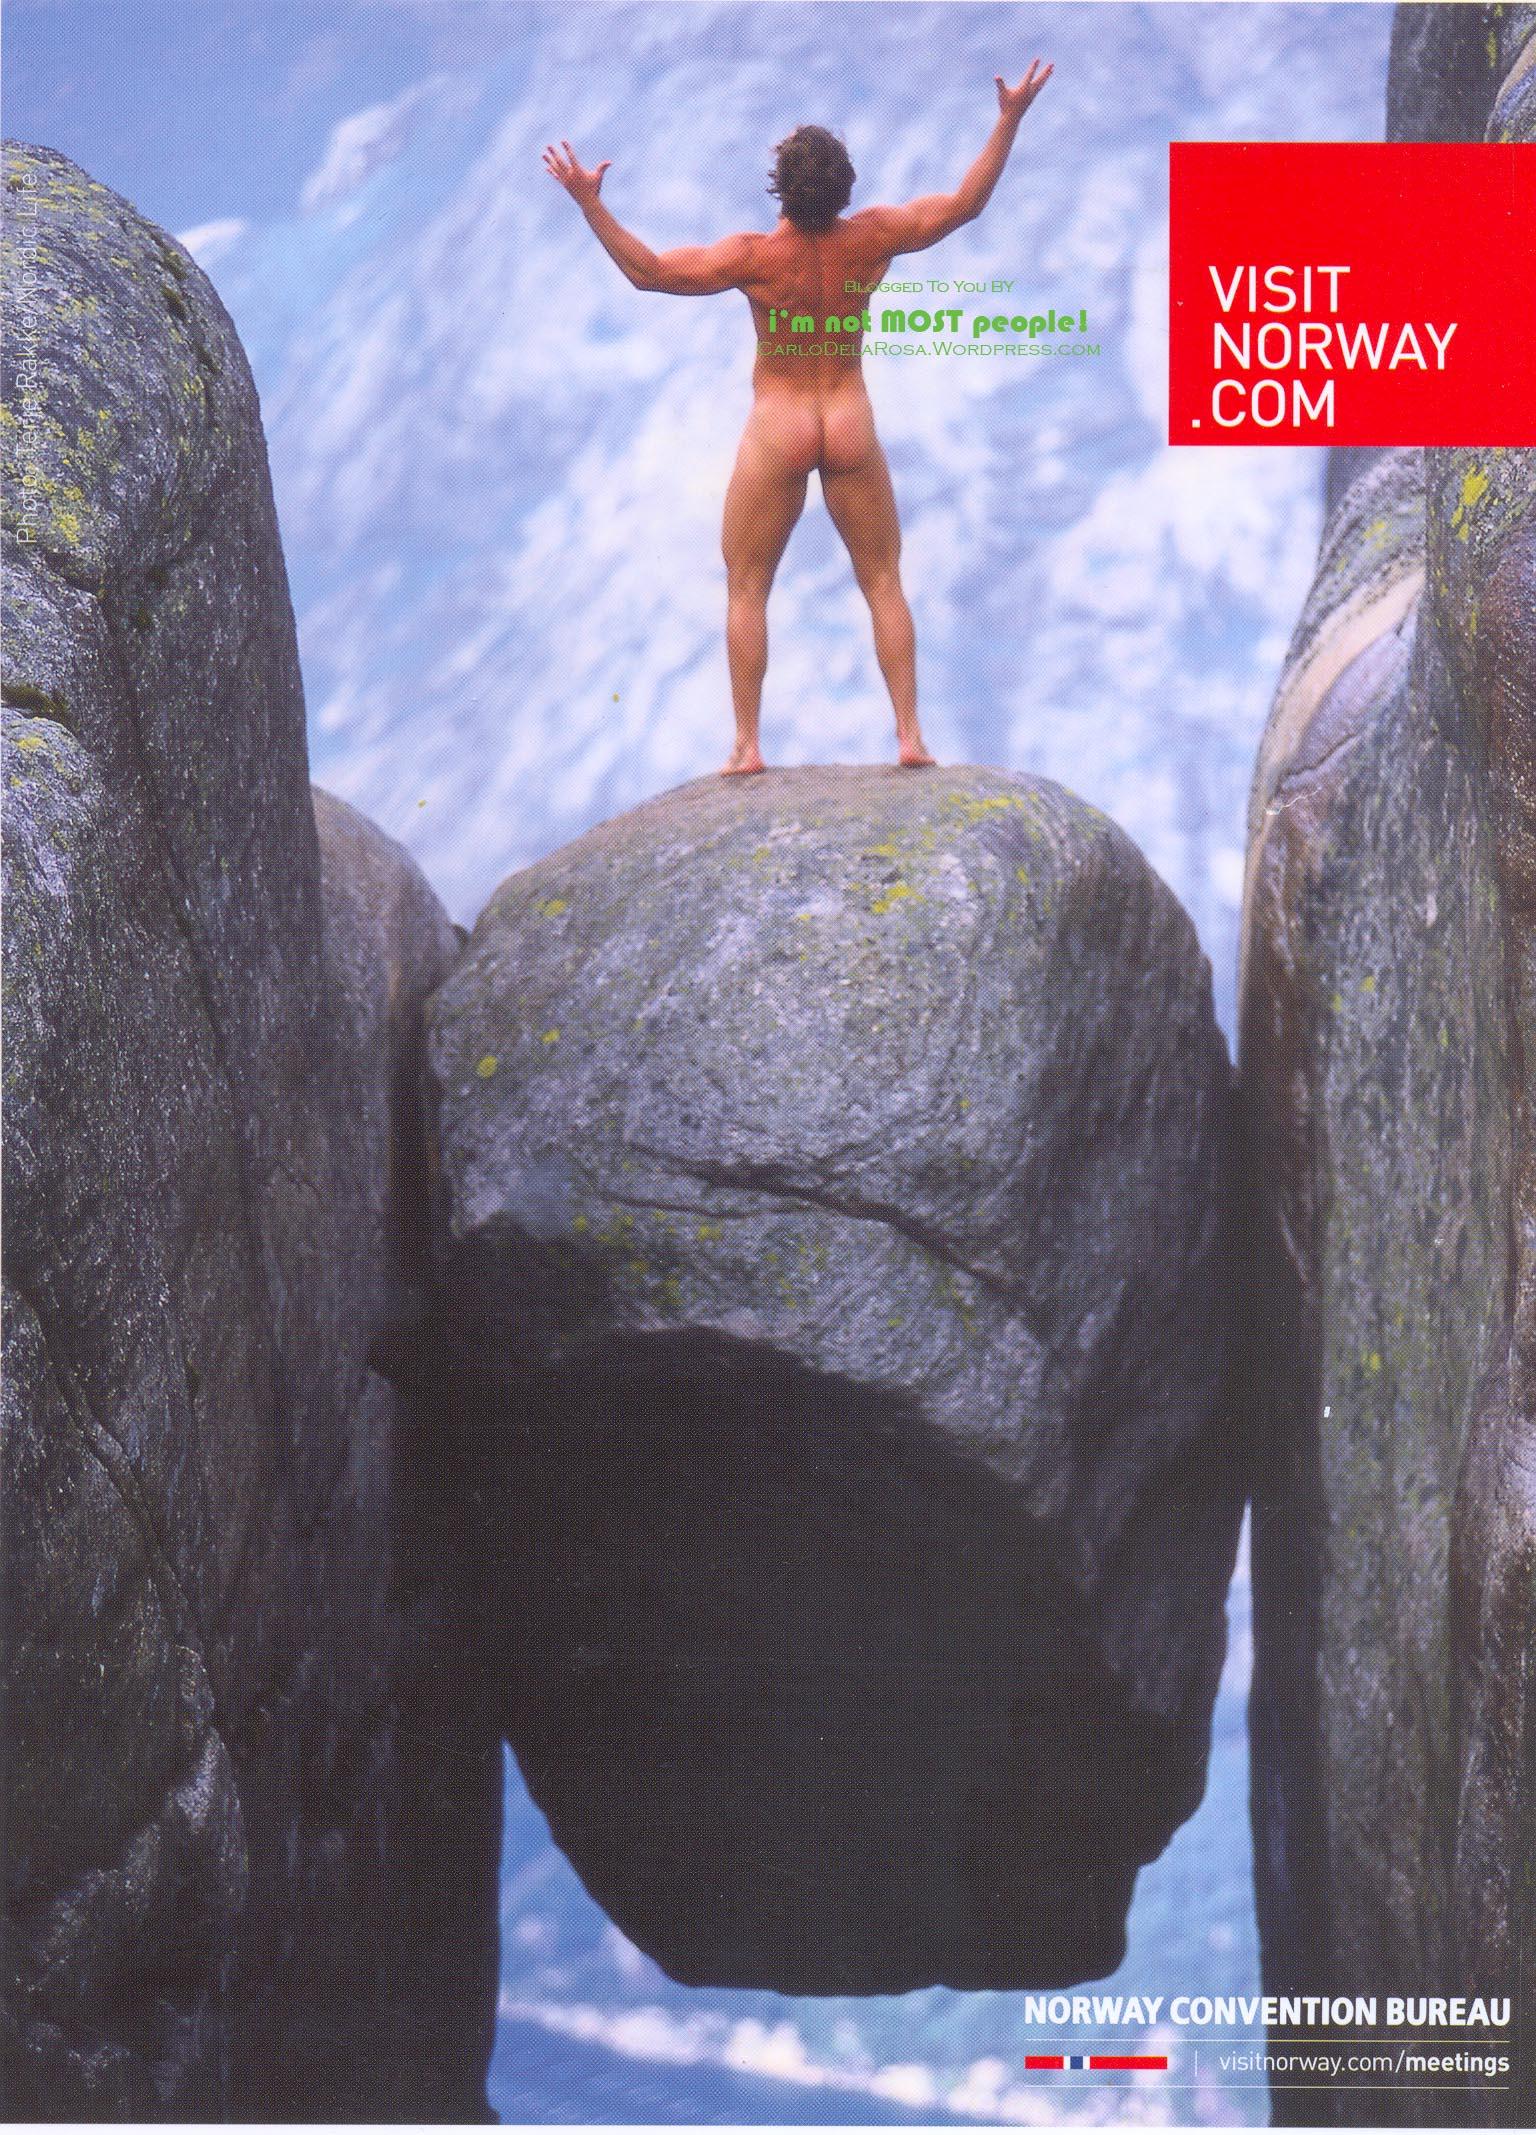 visit norway: